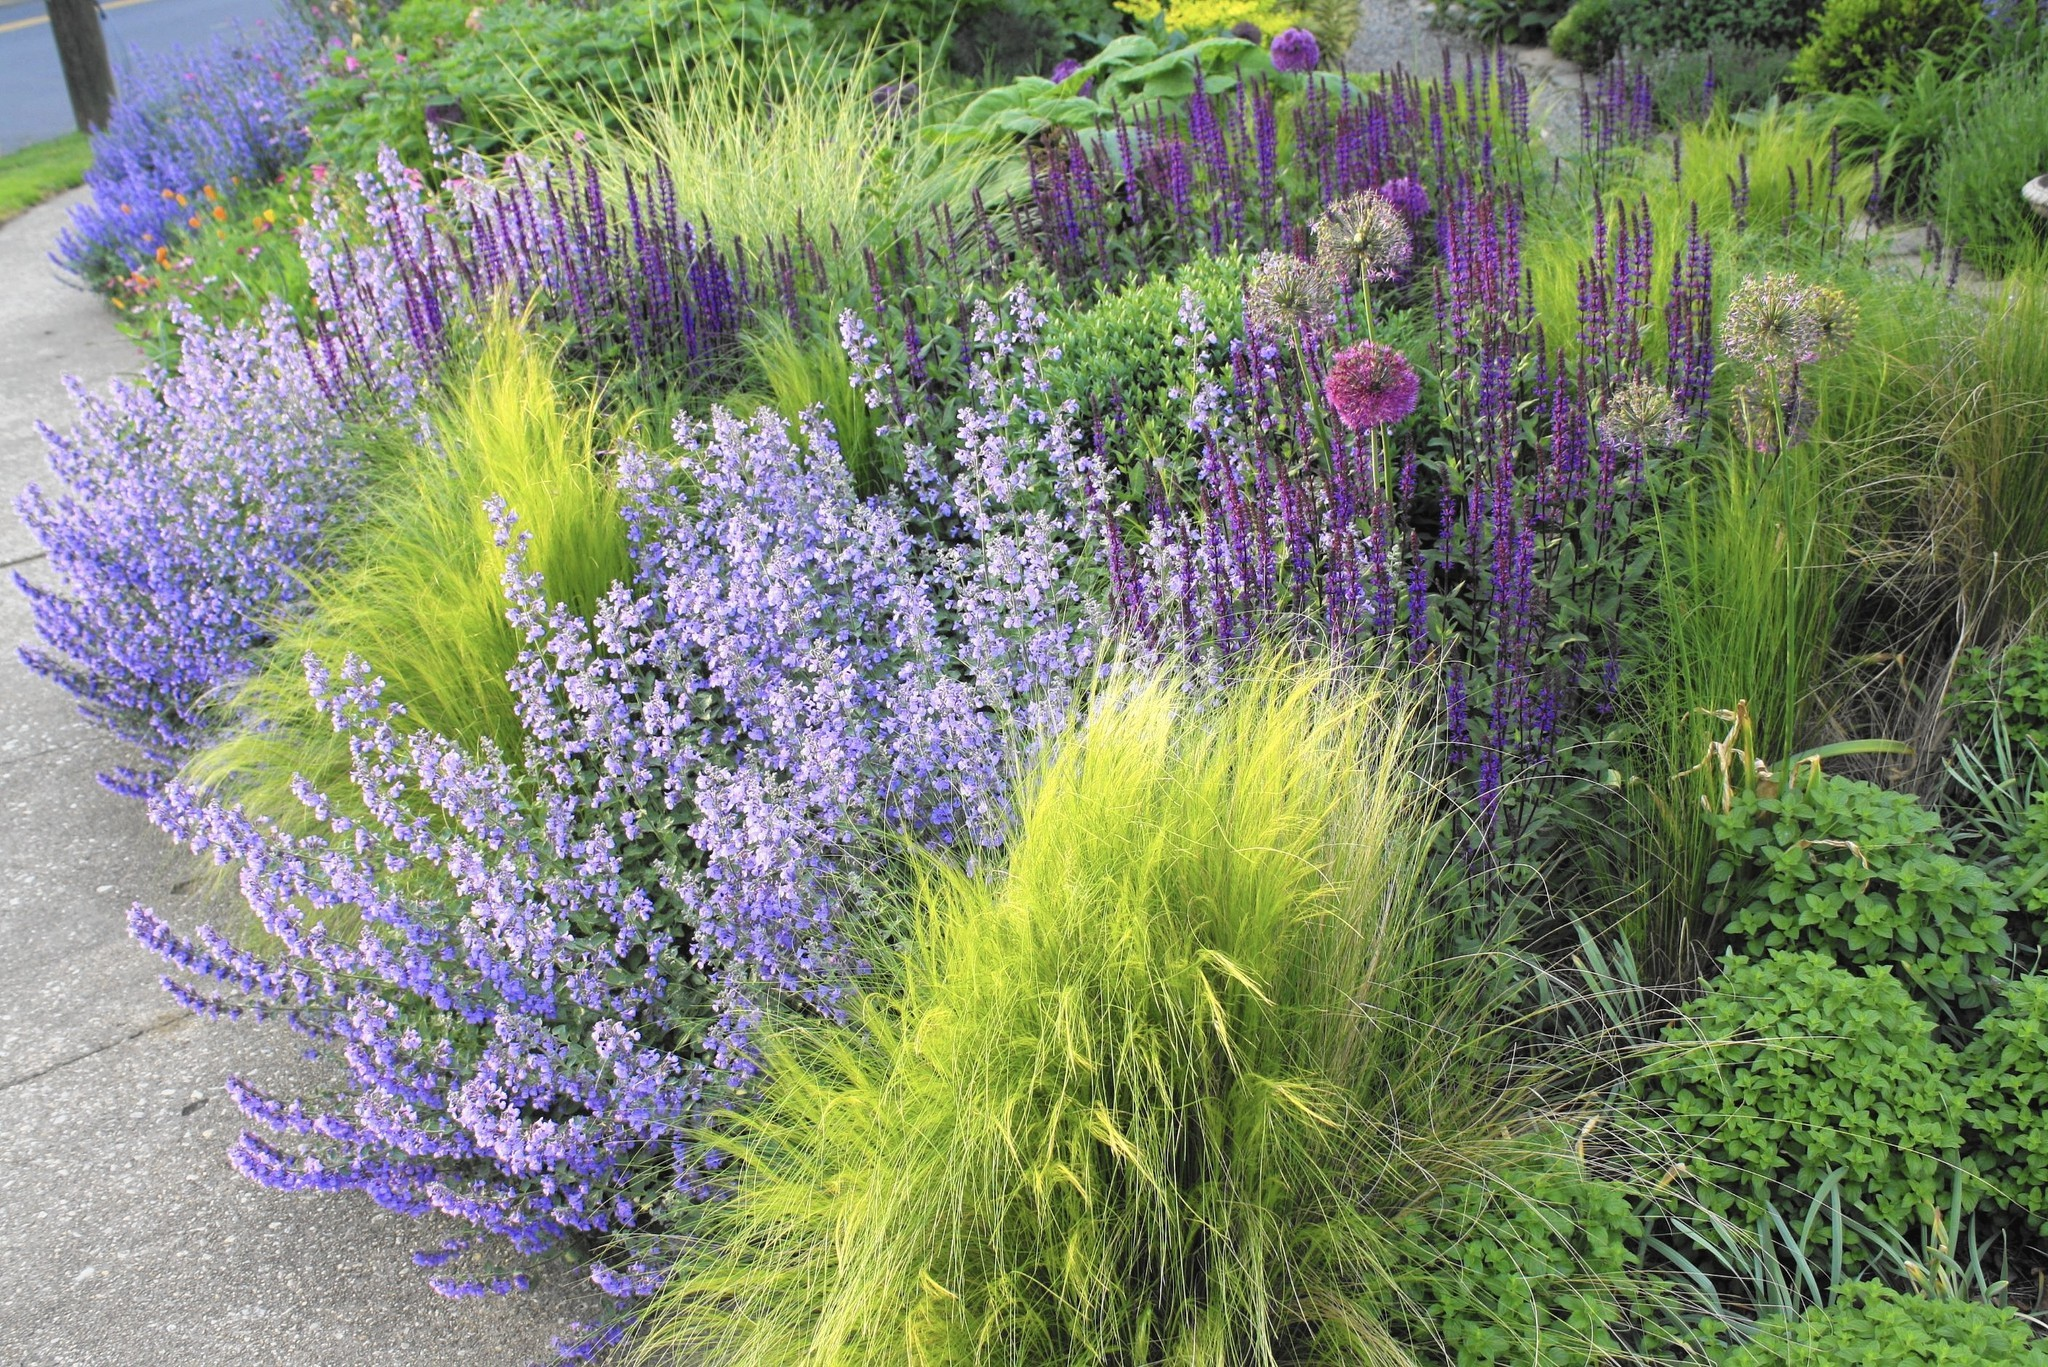 New way to garden chicago tribune for Wild grass landscaping